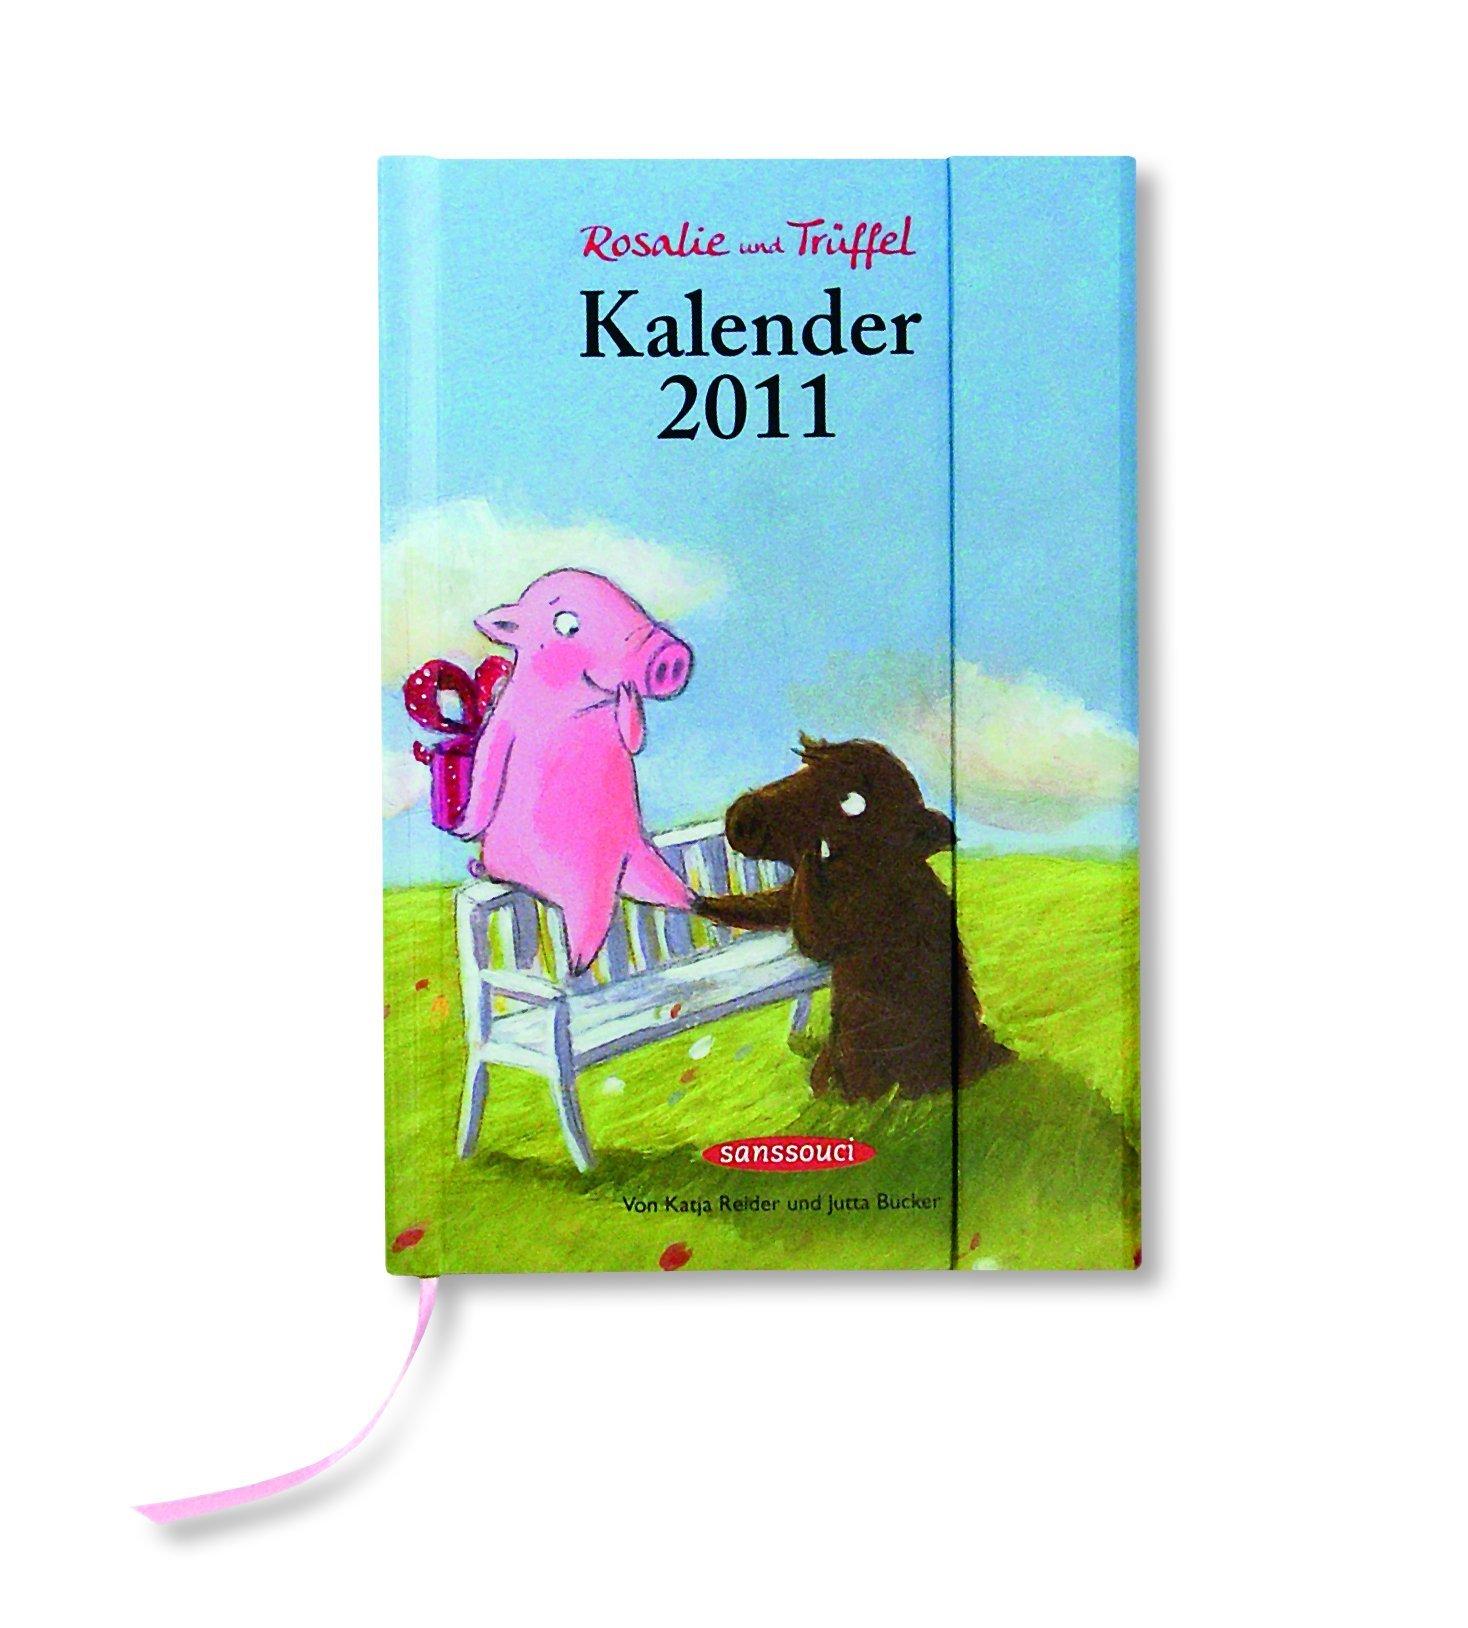 Kalender 2011 Rosalie und Trüffel